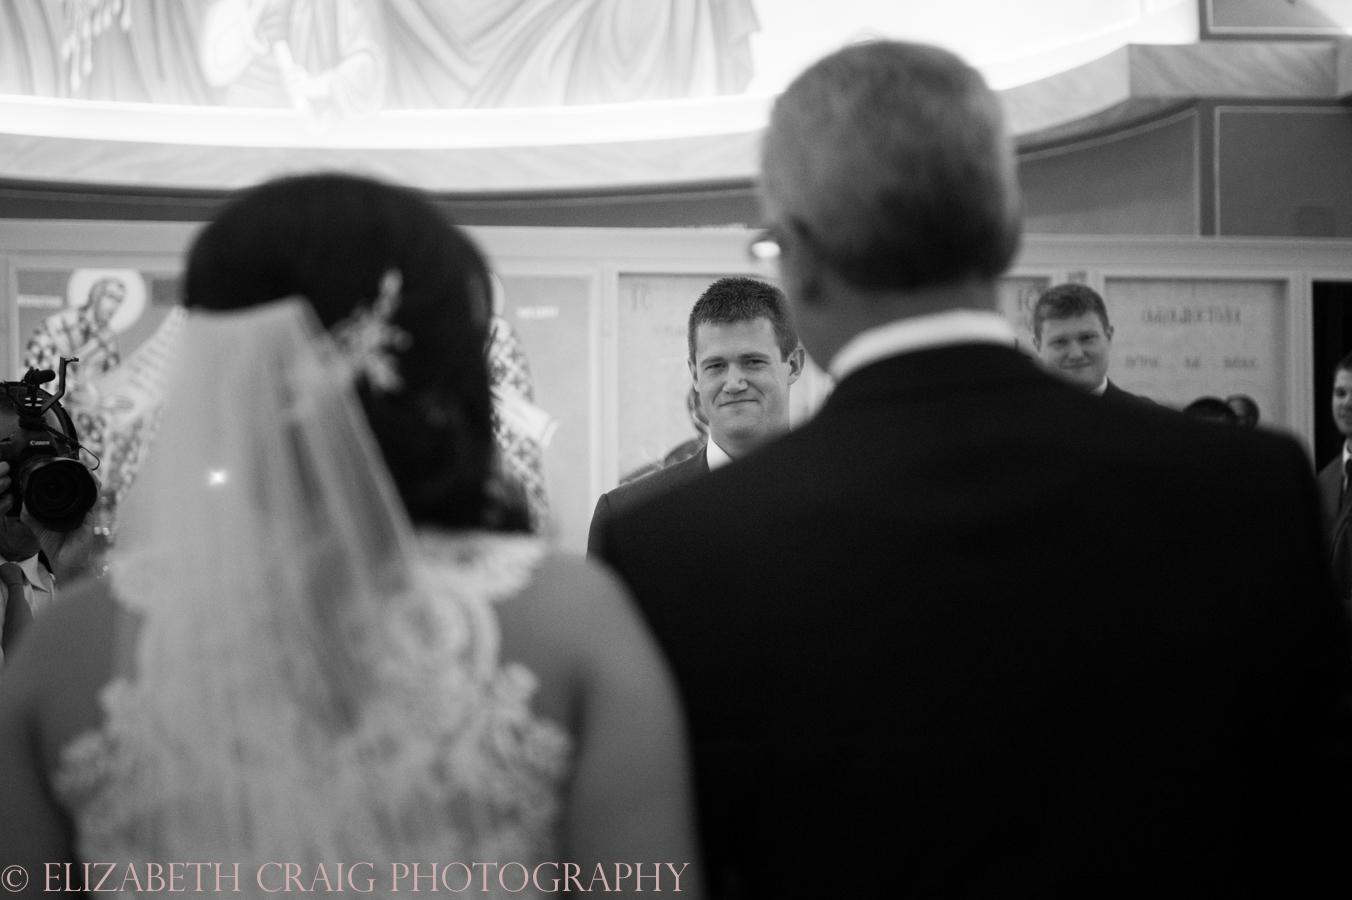 pittsburgh-greek-weddings-fairmont-weddings-receptions-elizabeth-craig-photohgraphy-007